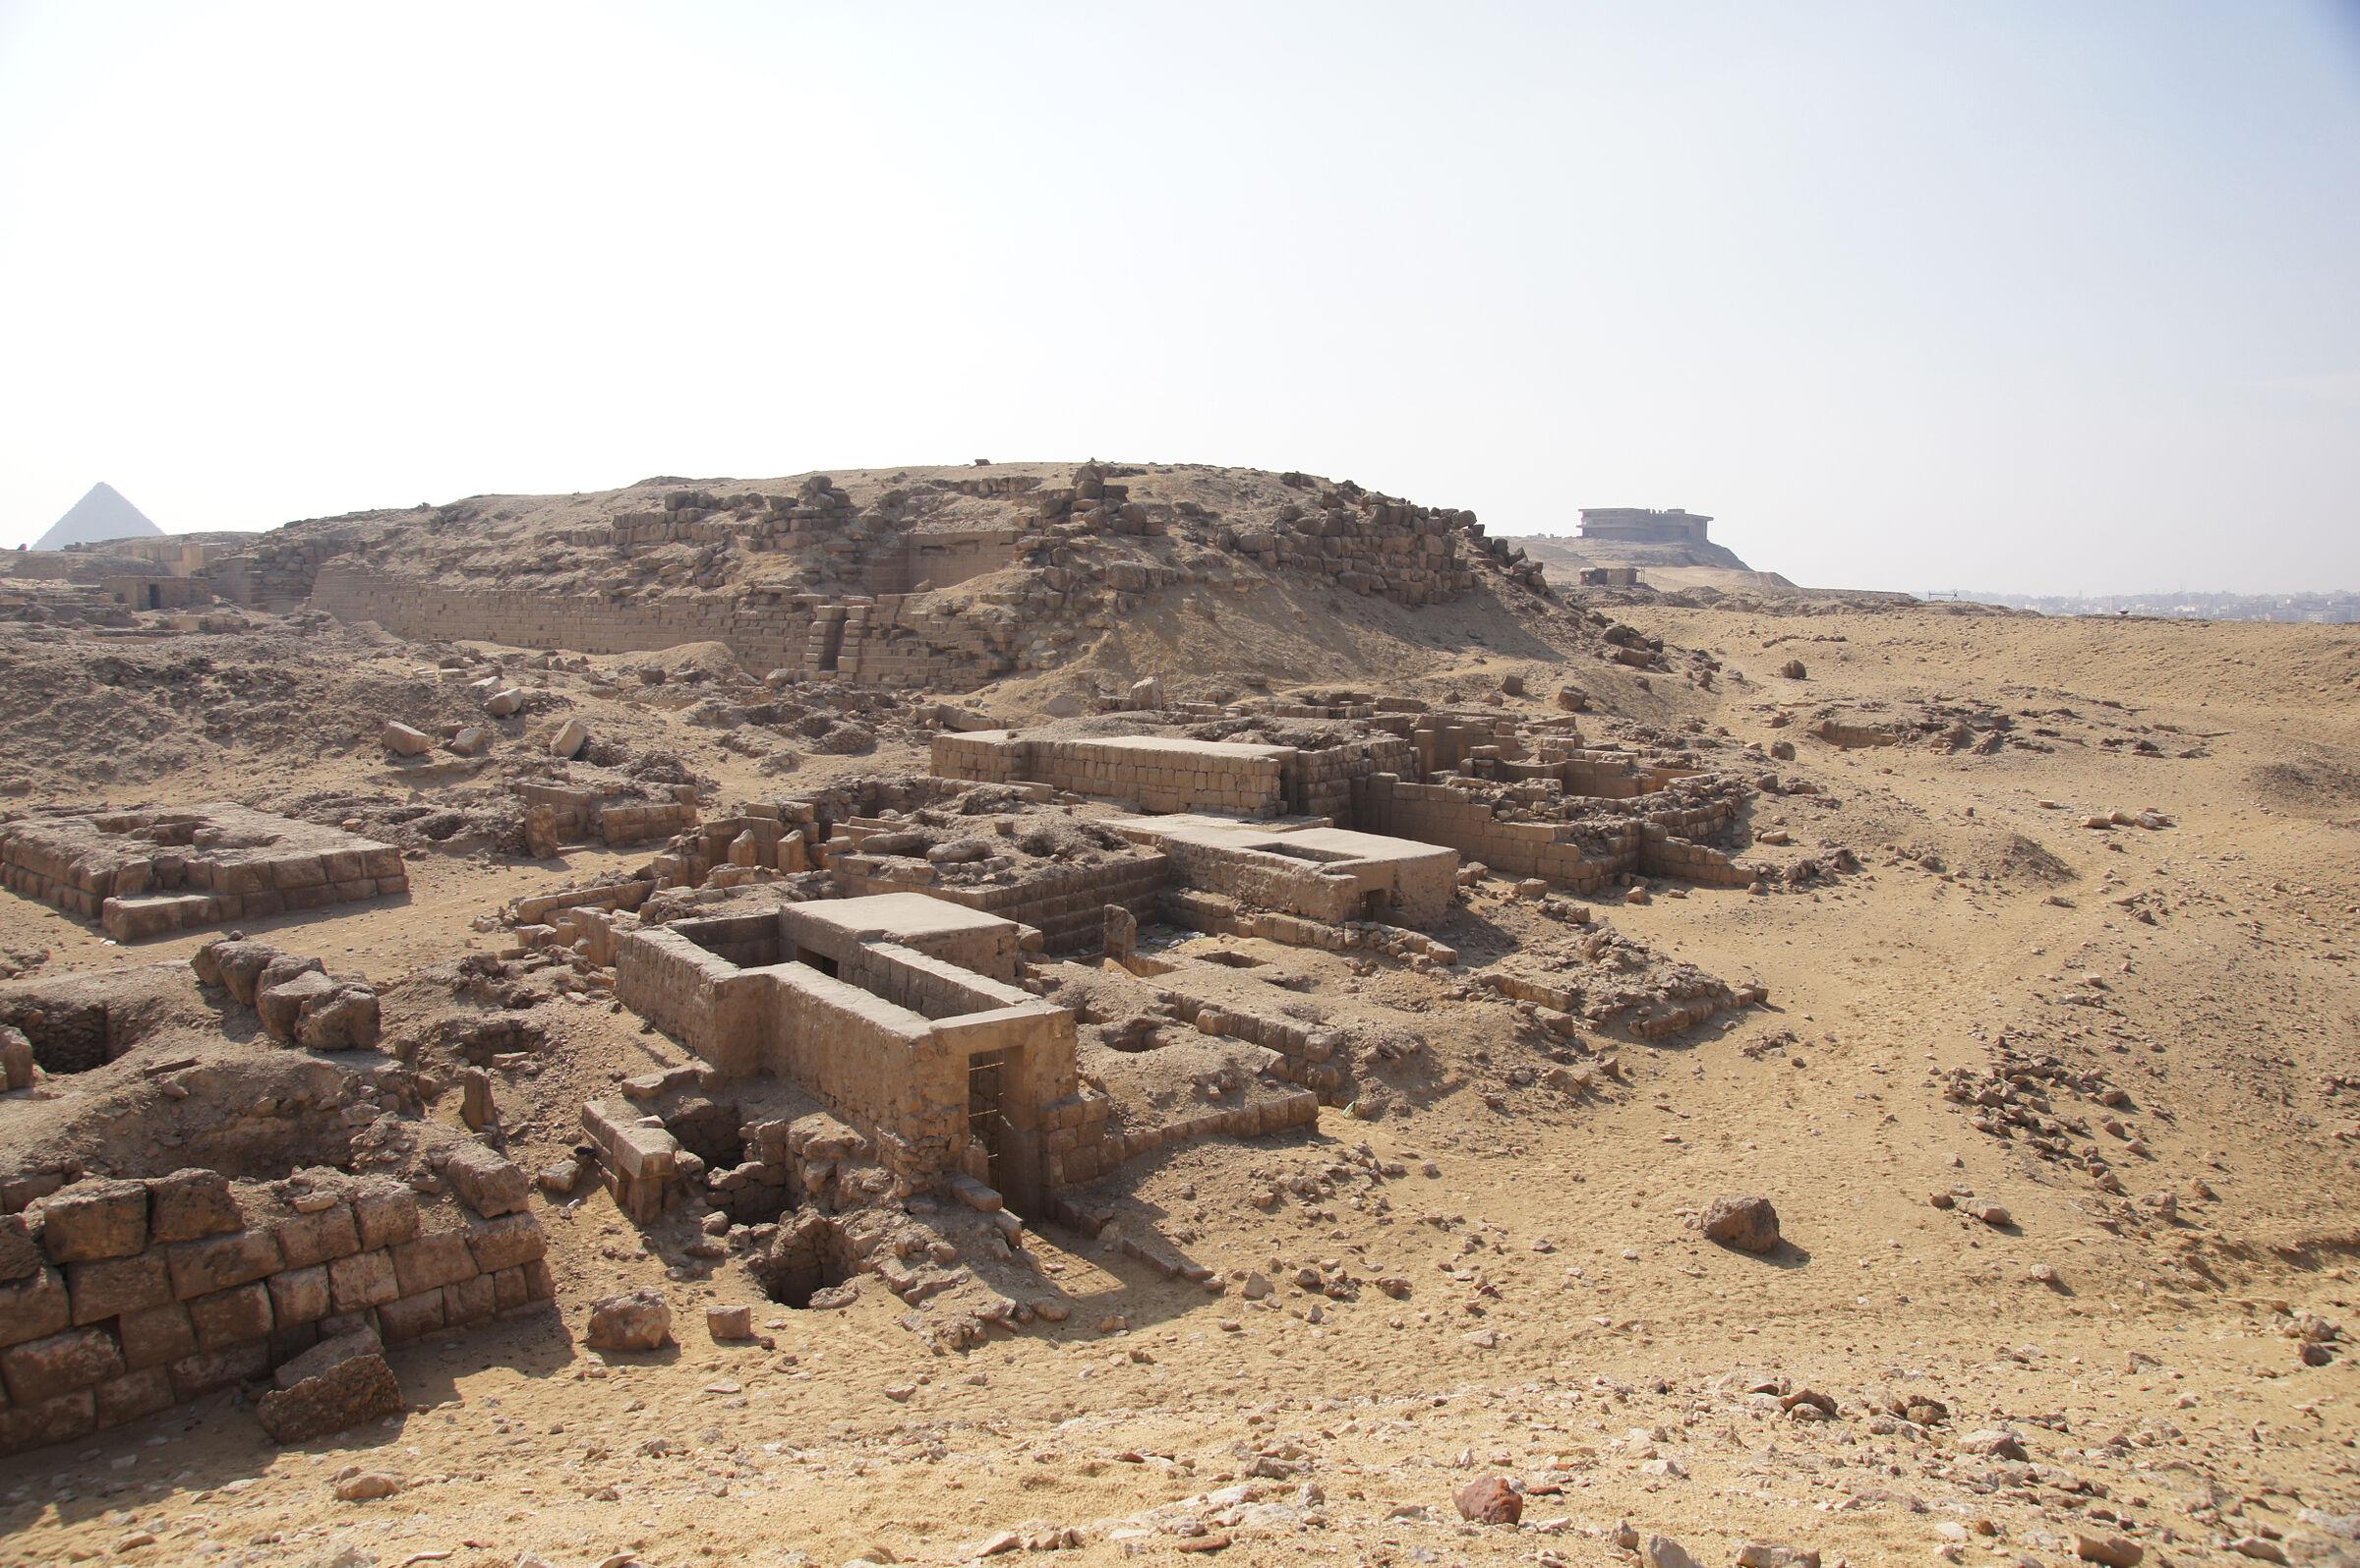 Western Cemetery: Site: Giza; View: G 2230+2231: G 2230, G 2085, G 2084, G 2086, G 2087, G 2088, G 2099, G 2098, G 2089, G 2097, G 2091, G 2093, G 2095, G 2094, G 2071,  G 2072, G 2074, G 2073, G 2075, G 2076, G 2077, G 2501, G 2509, G 2505, G 2507, G 2000